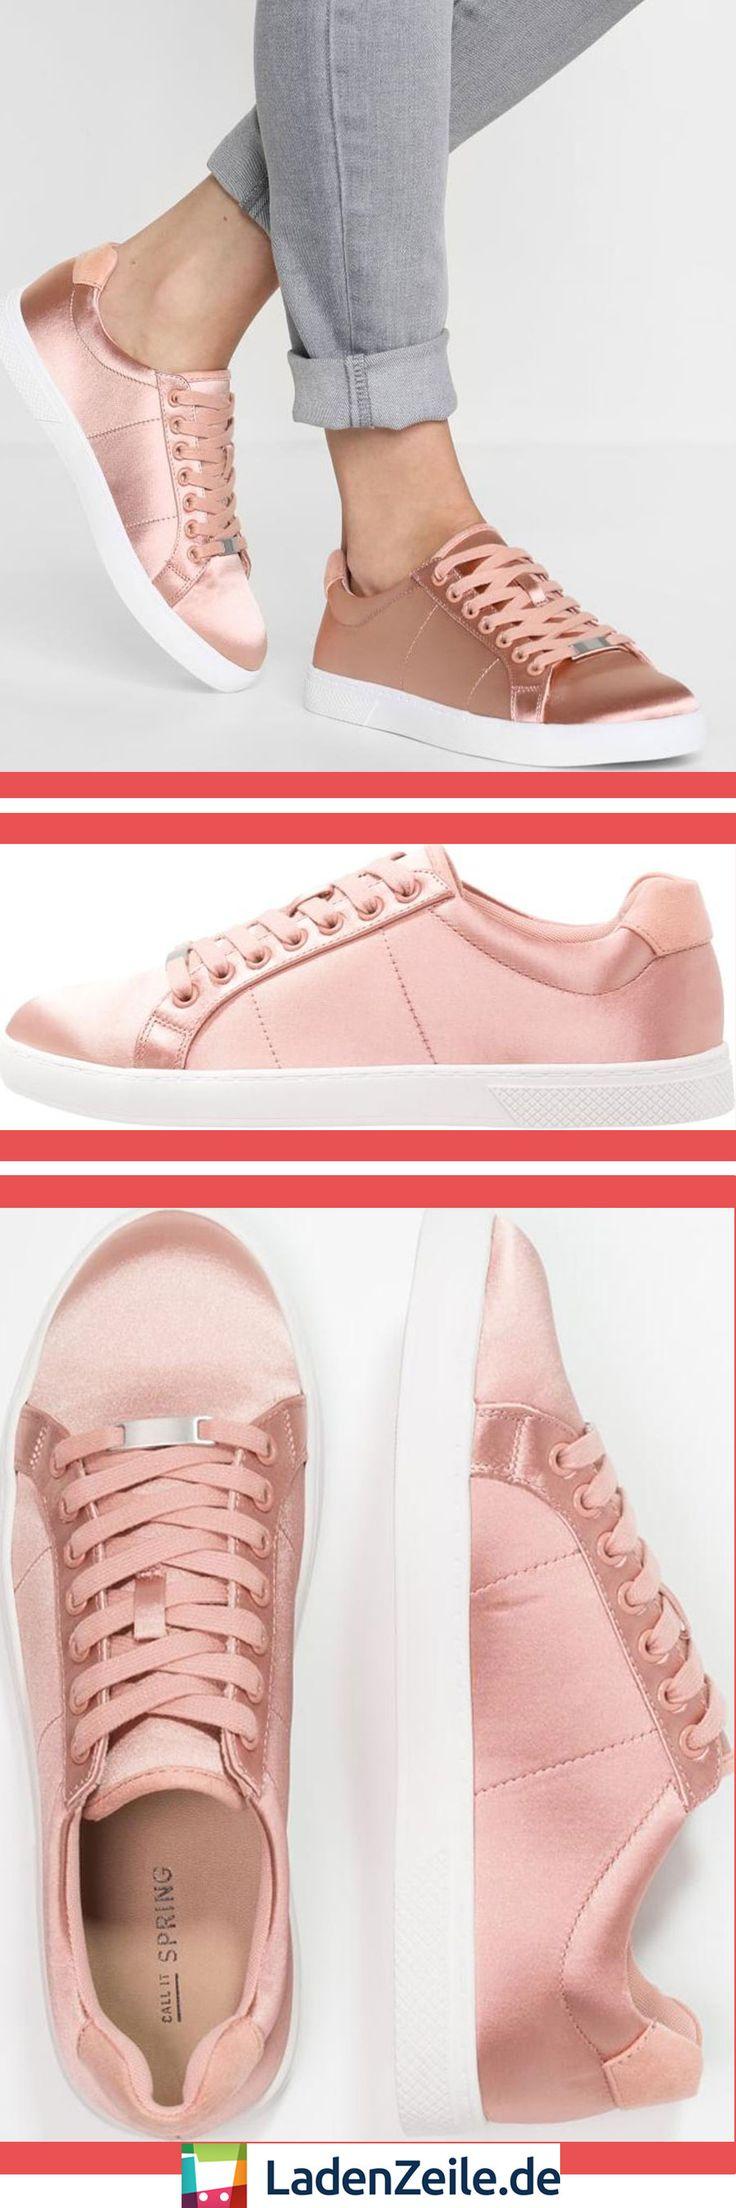 Rosa Schuhe für Damen, Sneaker, Mettalic, Schuhe,